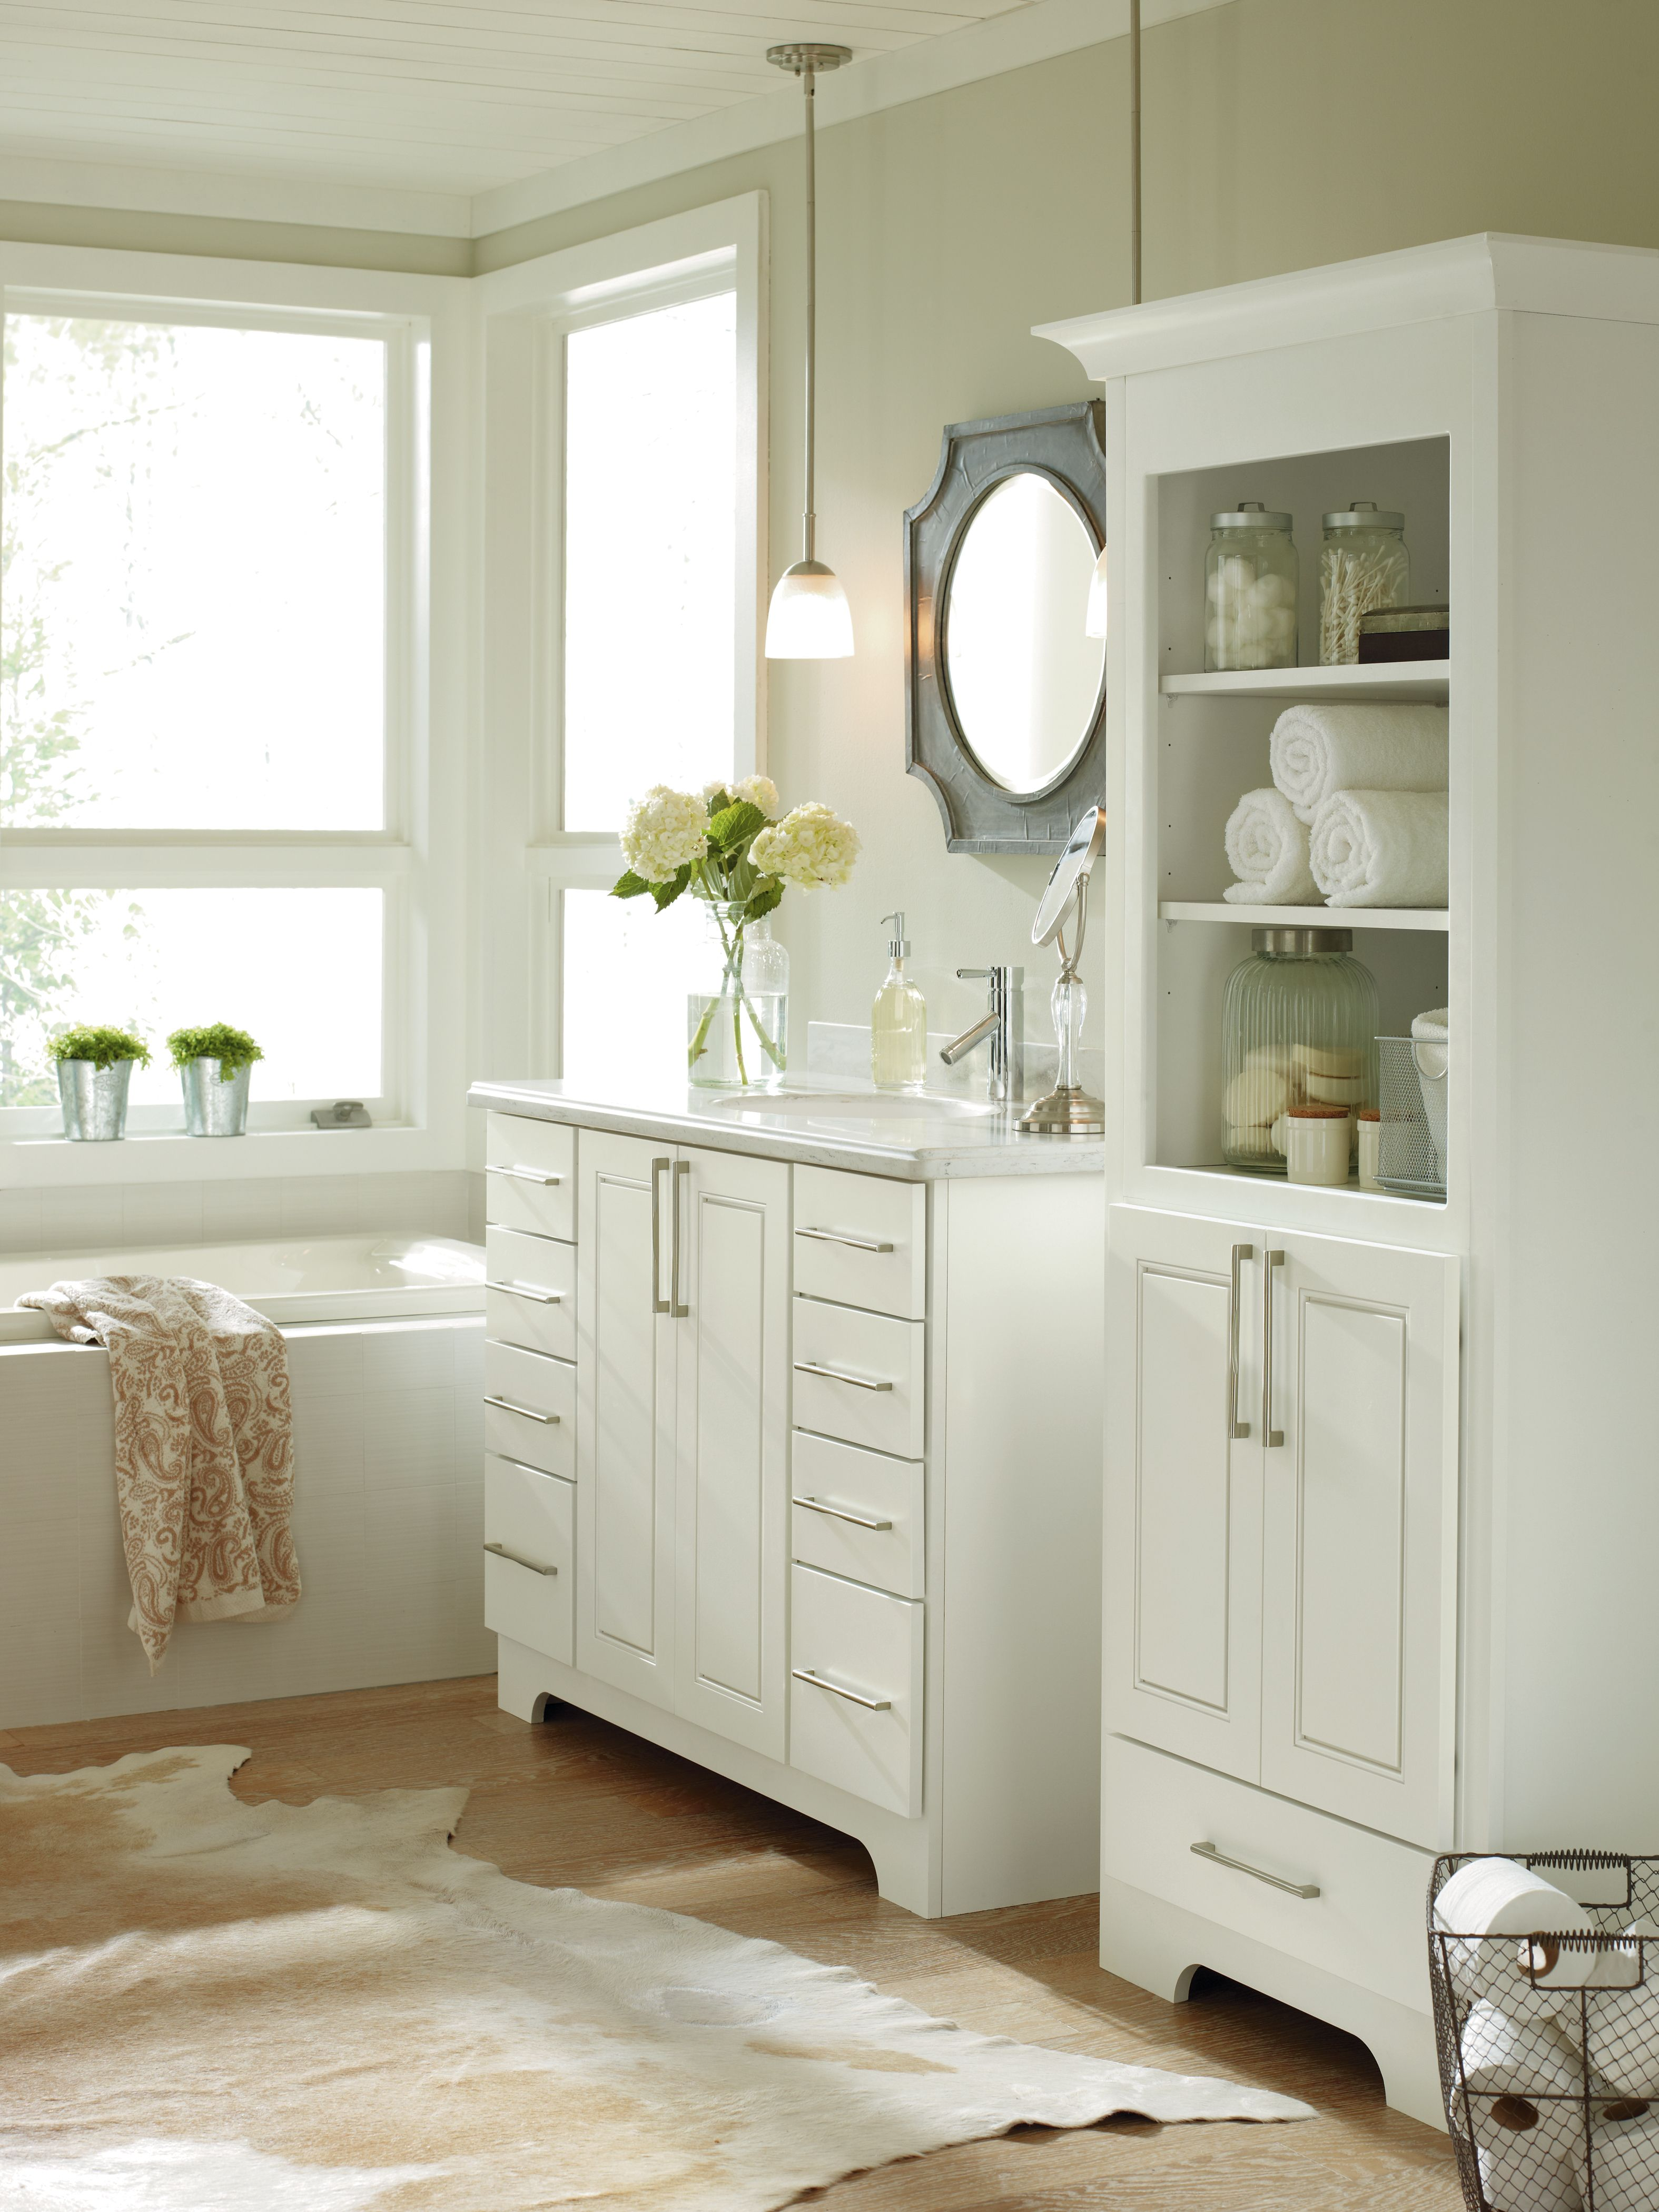 New Bathroom Vanities Portland Oregon Fresh 31 For Your Home Design